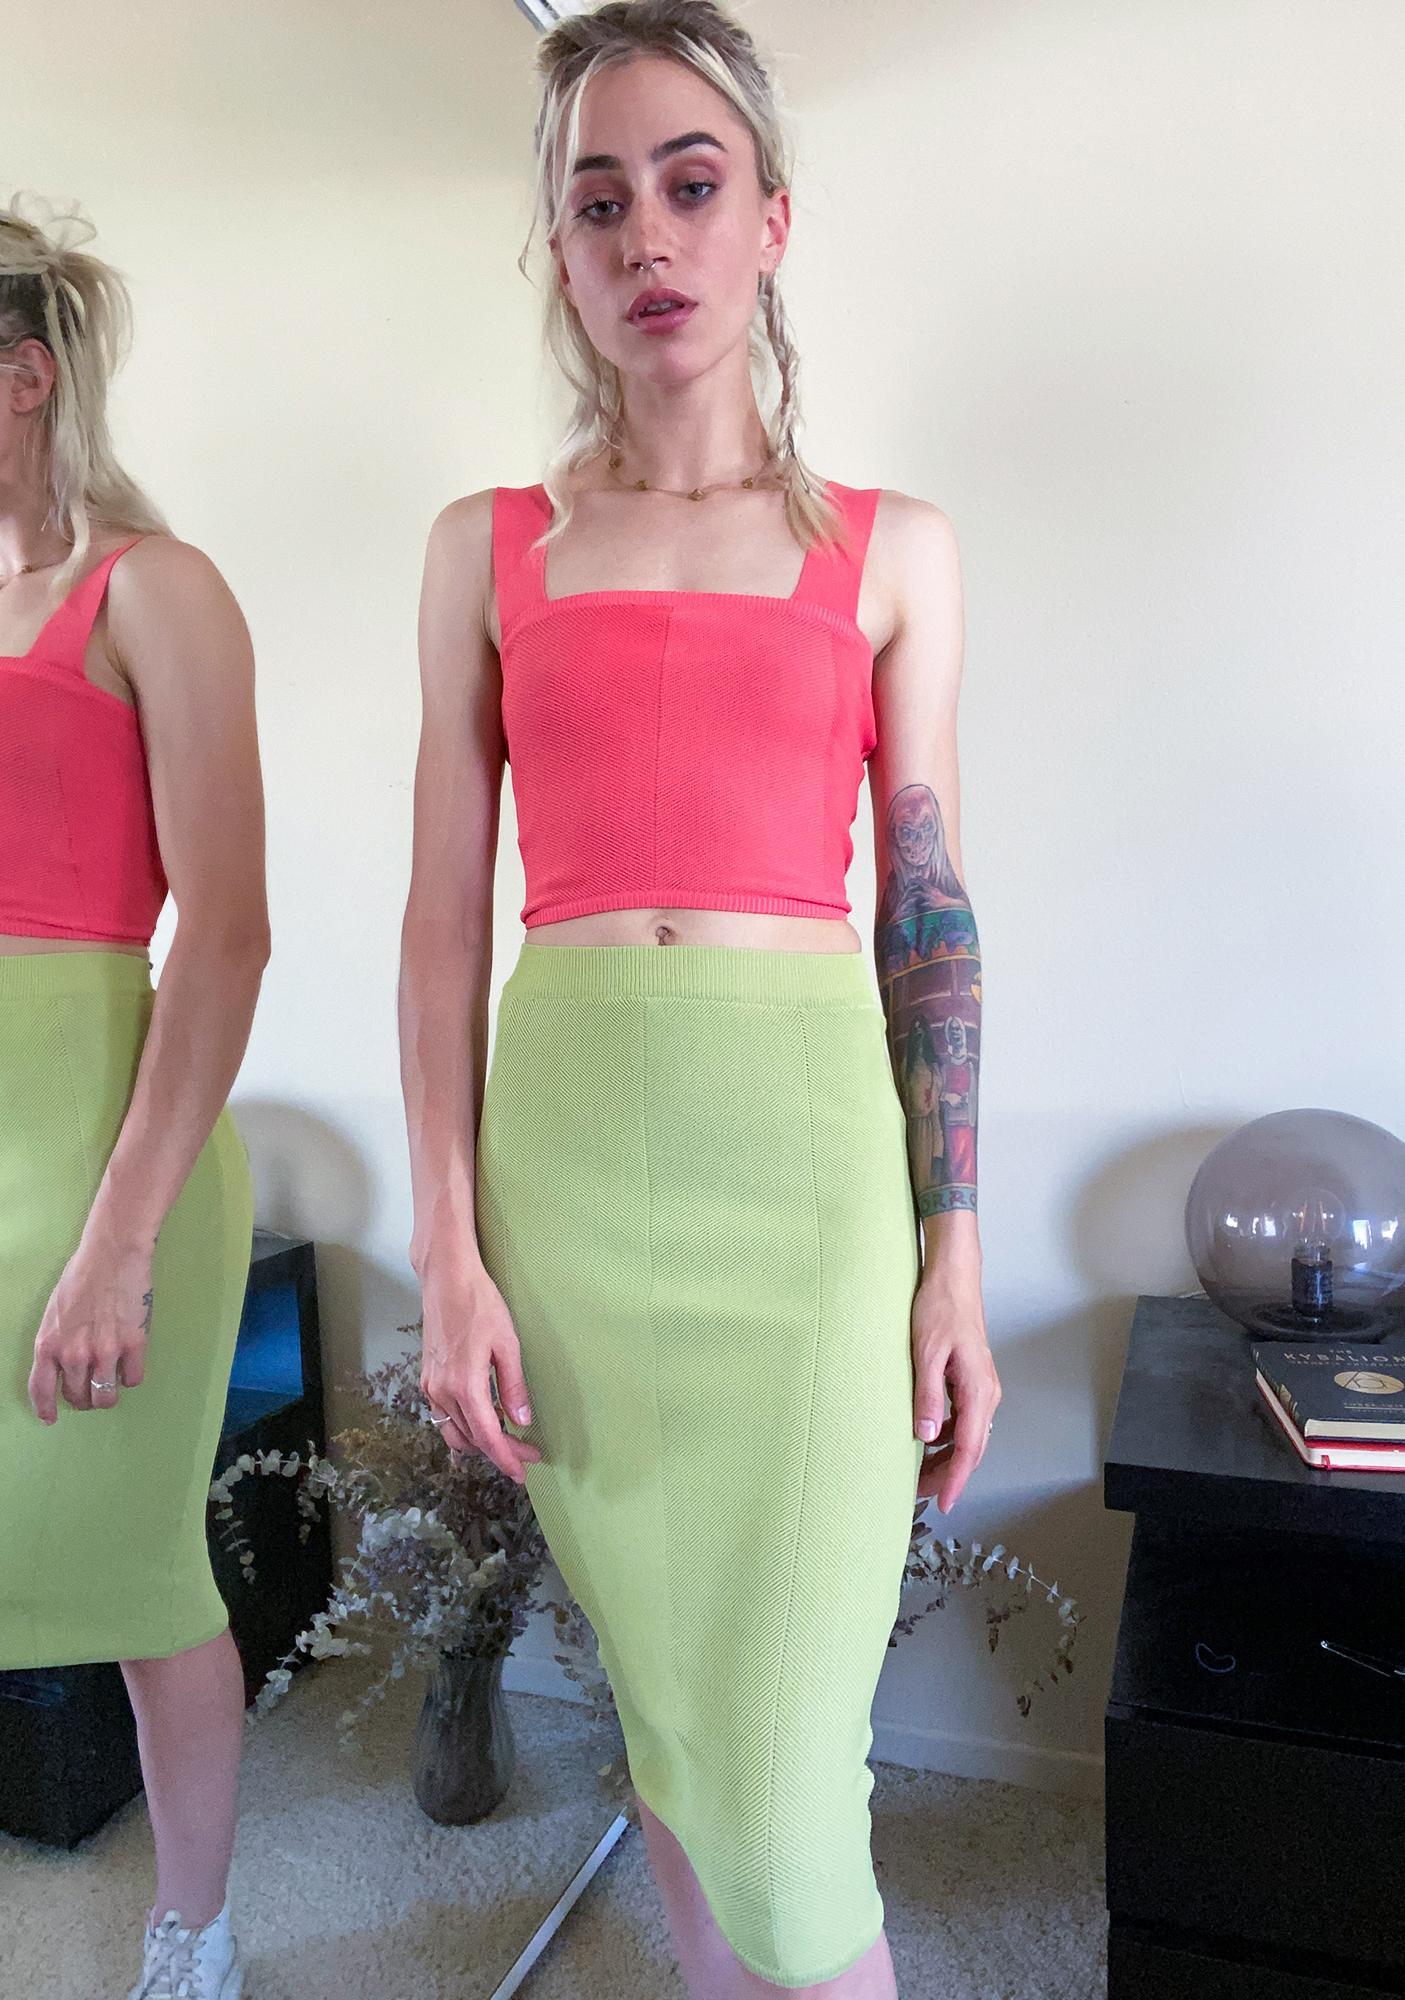 Mink Pink Watermelon Chevron Knit Crop Tank